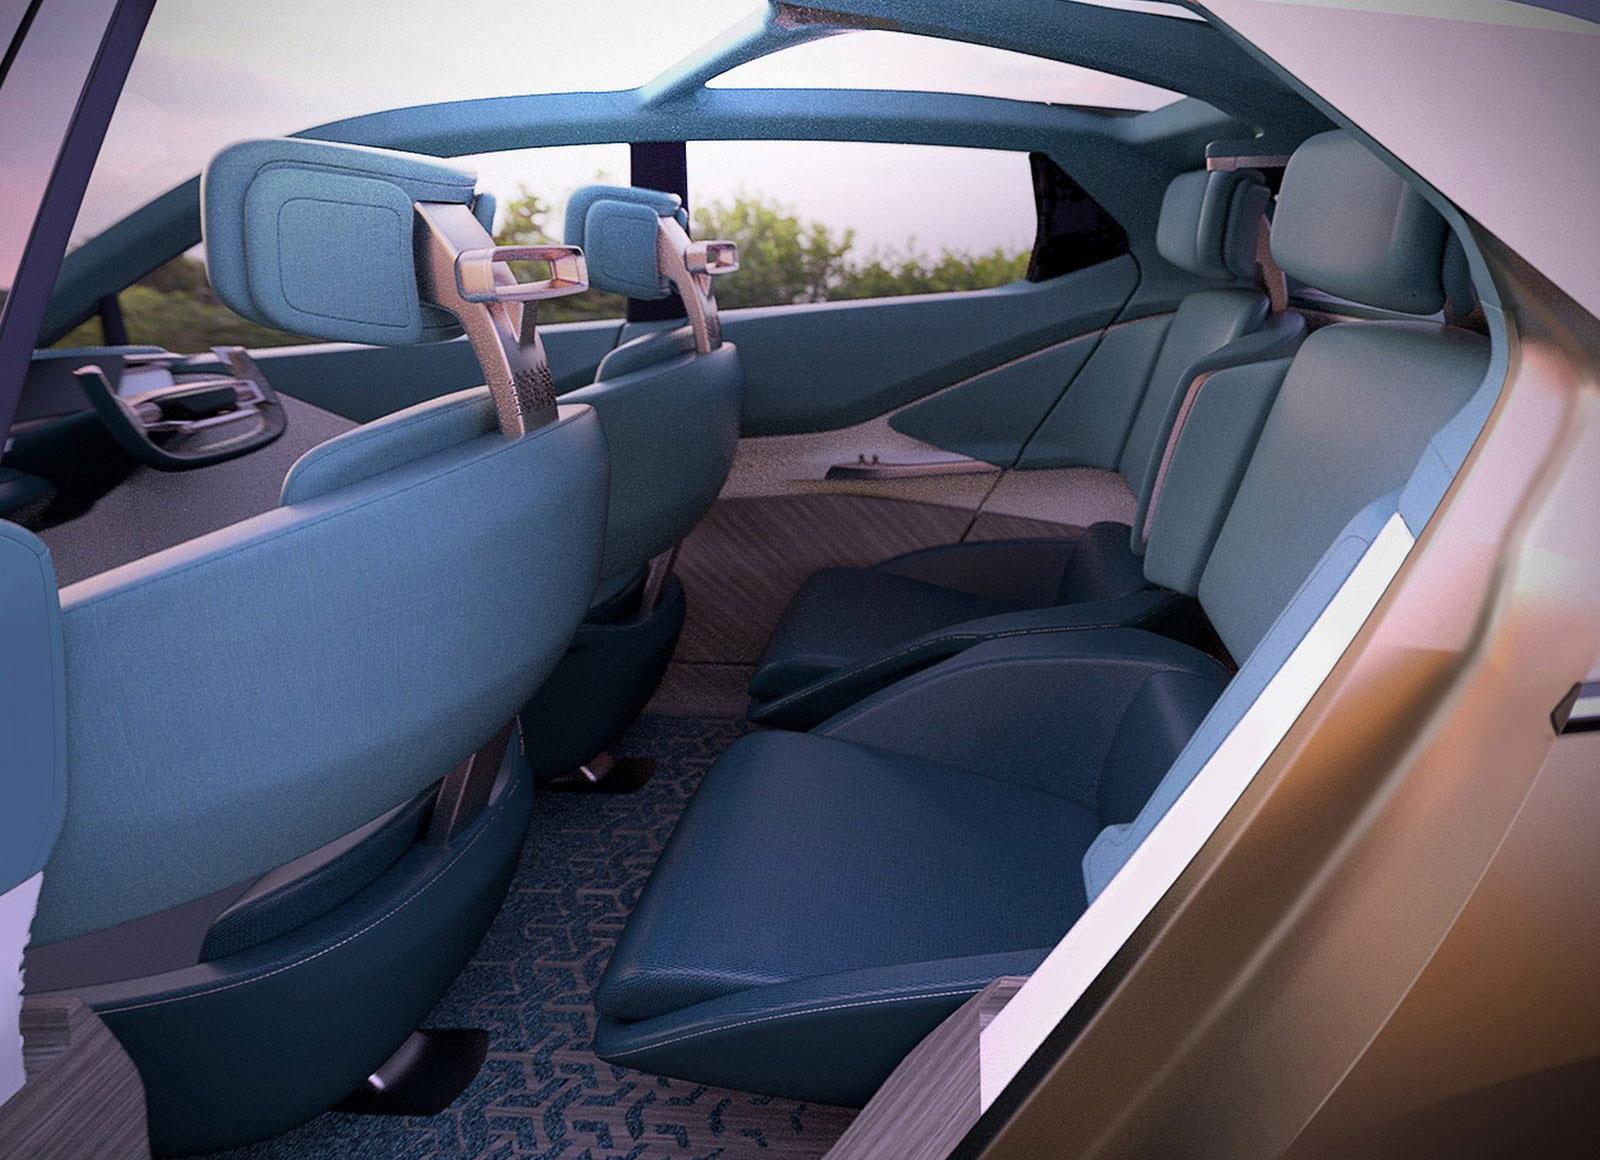 Tata 45x Concept Interior Design Render Car Body Design